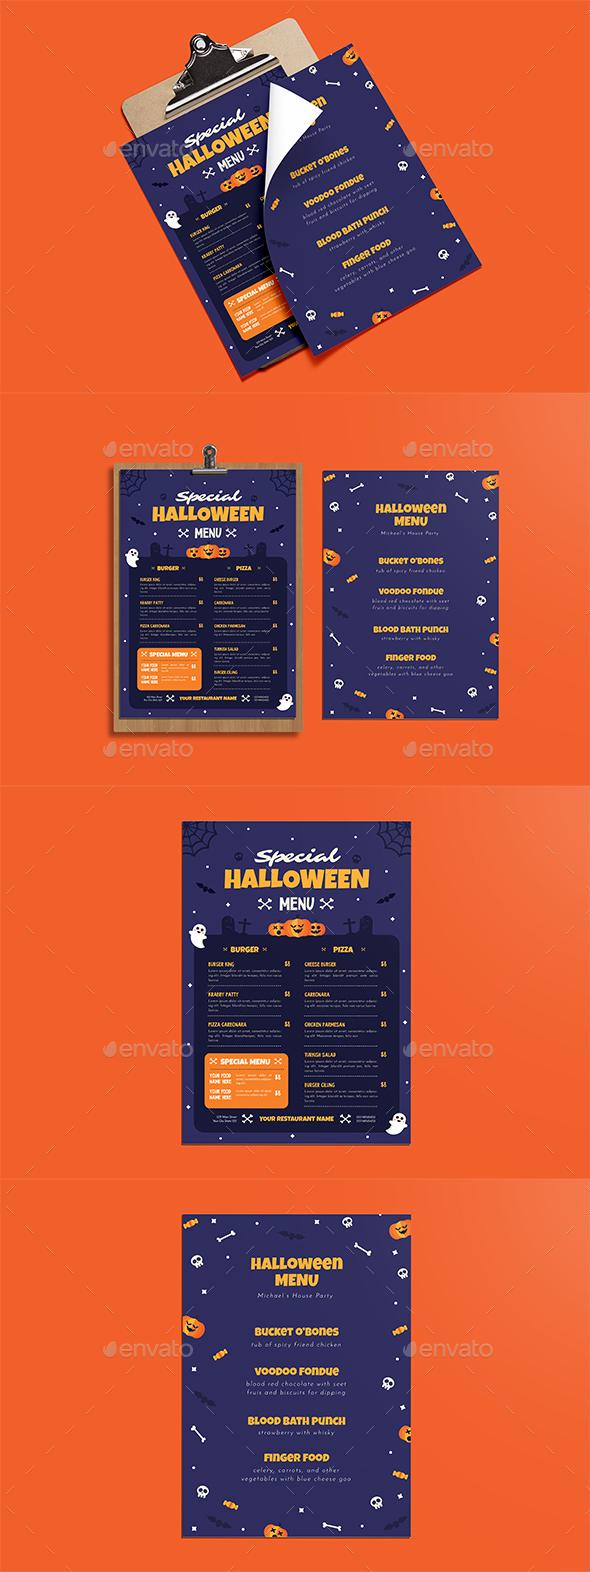 Special Halloween Menus - Restaurant Flyers